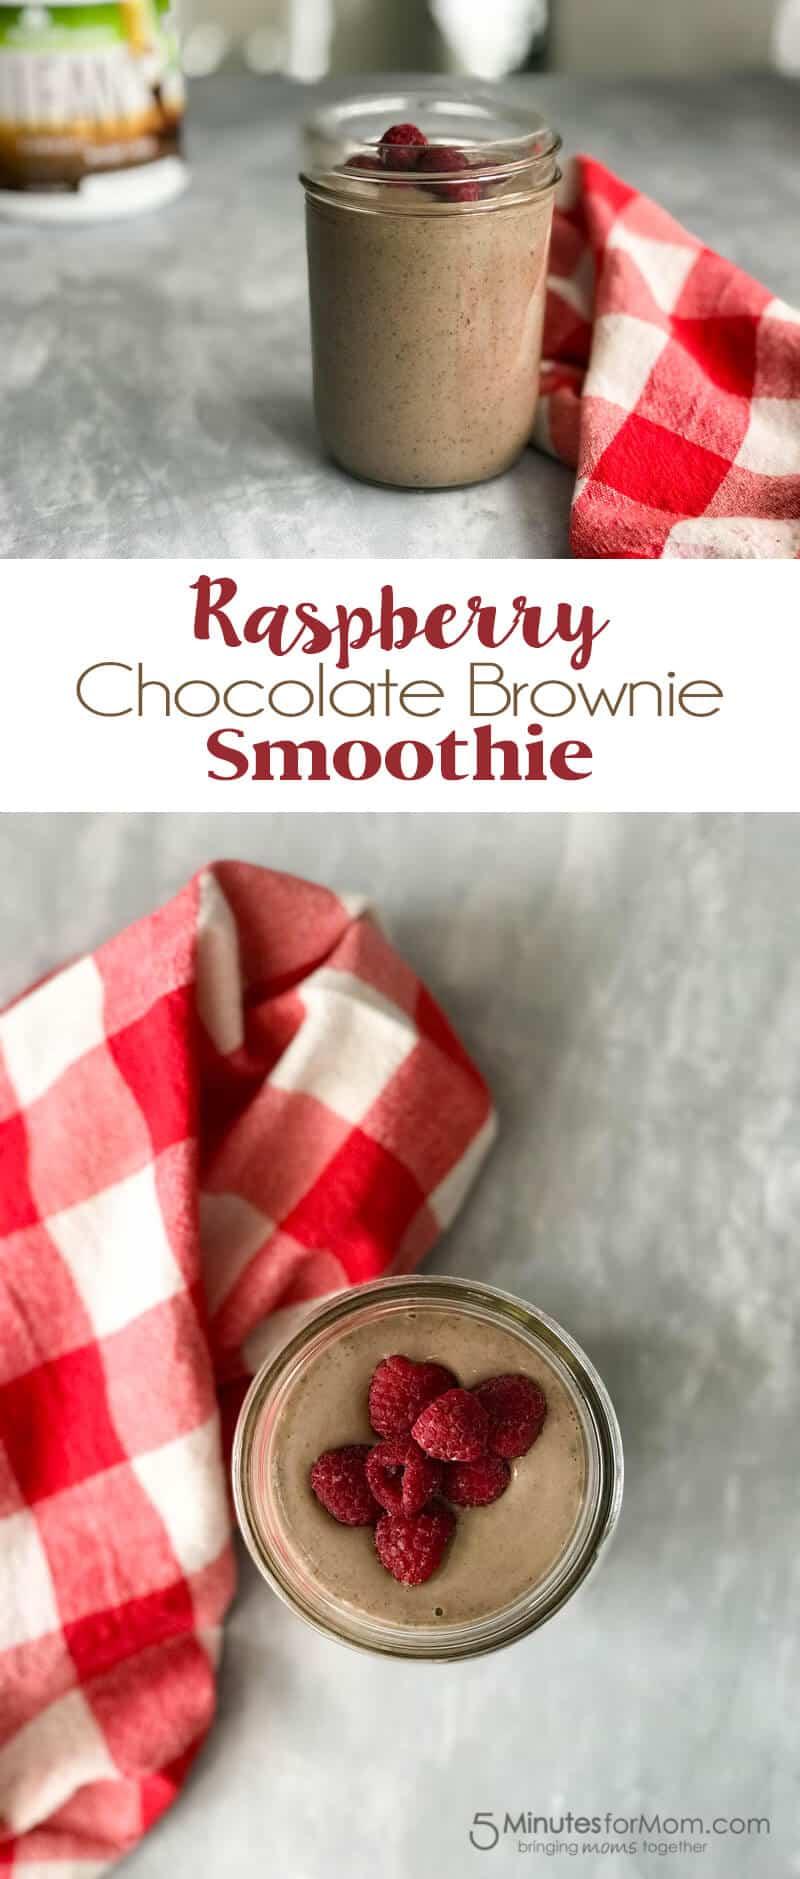 Raspberry Chocolate Brownie Smoothie